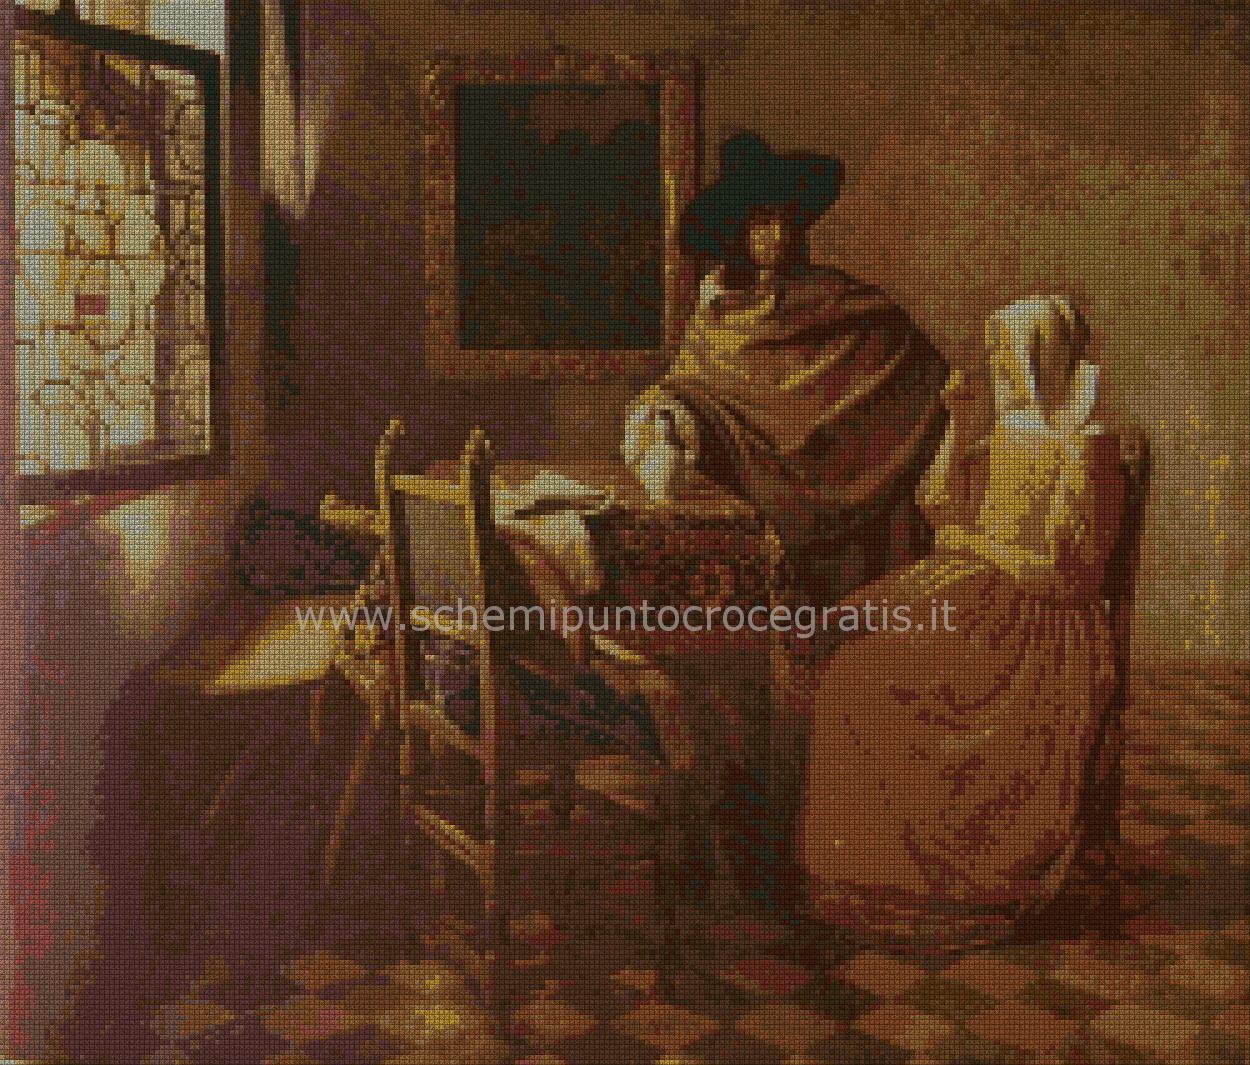 pittori_classici/vermeer/vermeer_05s.jpg